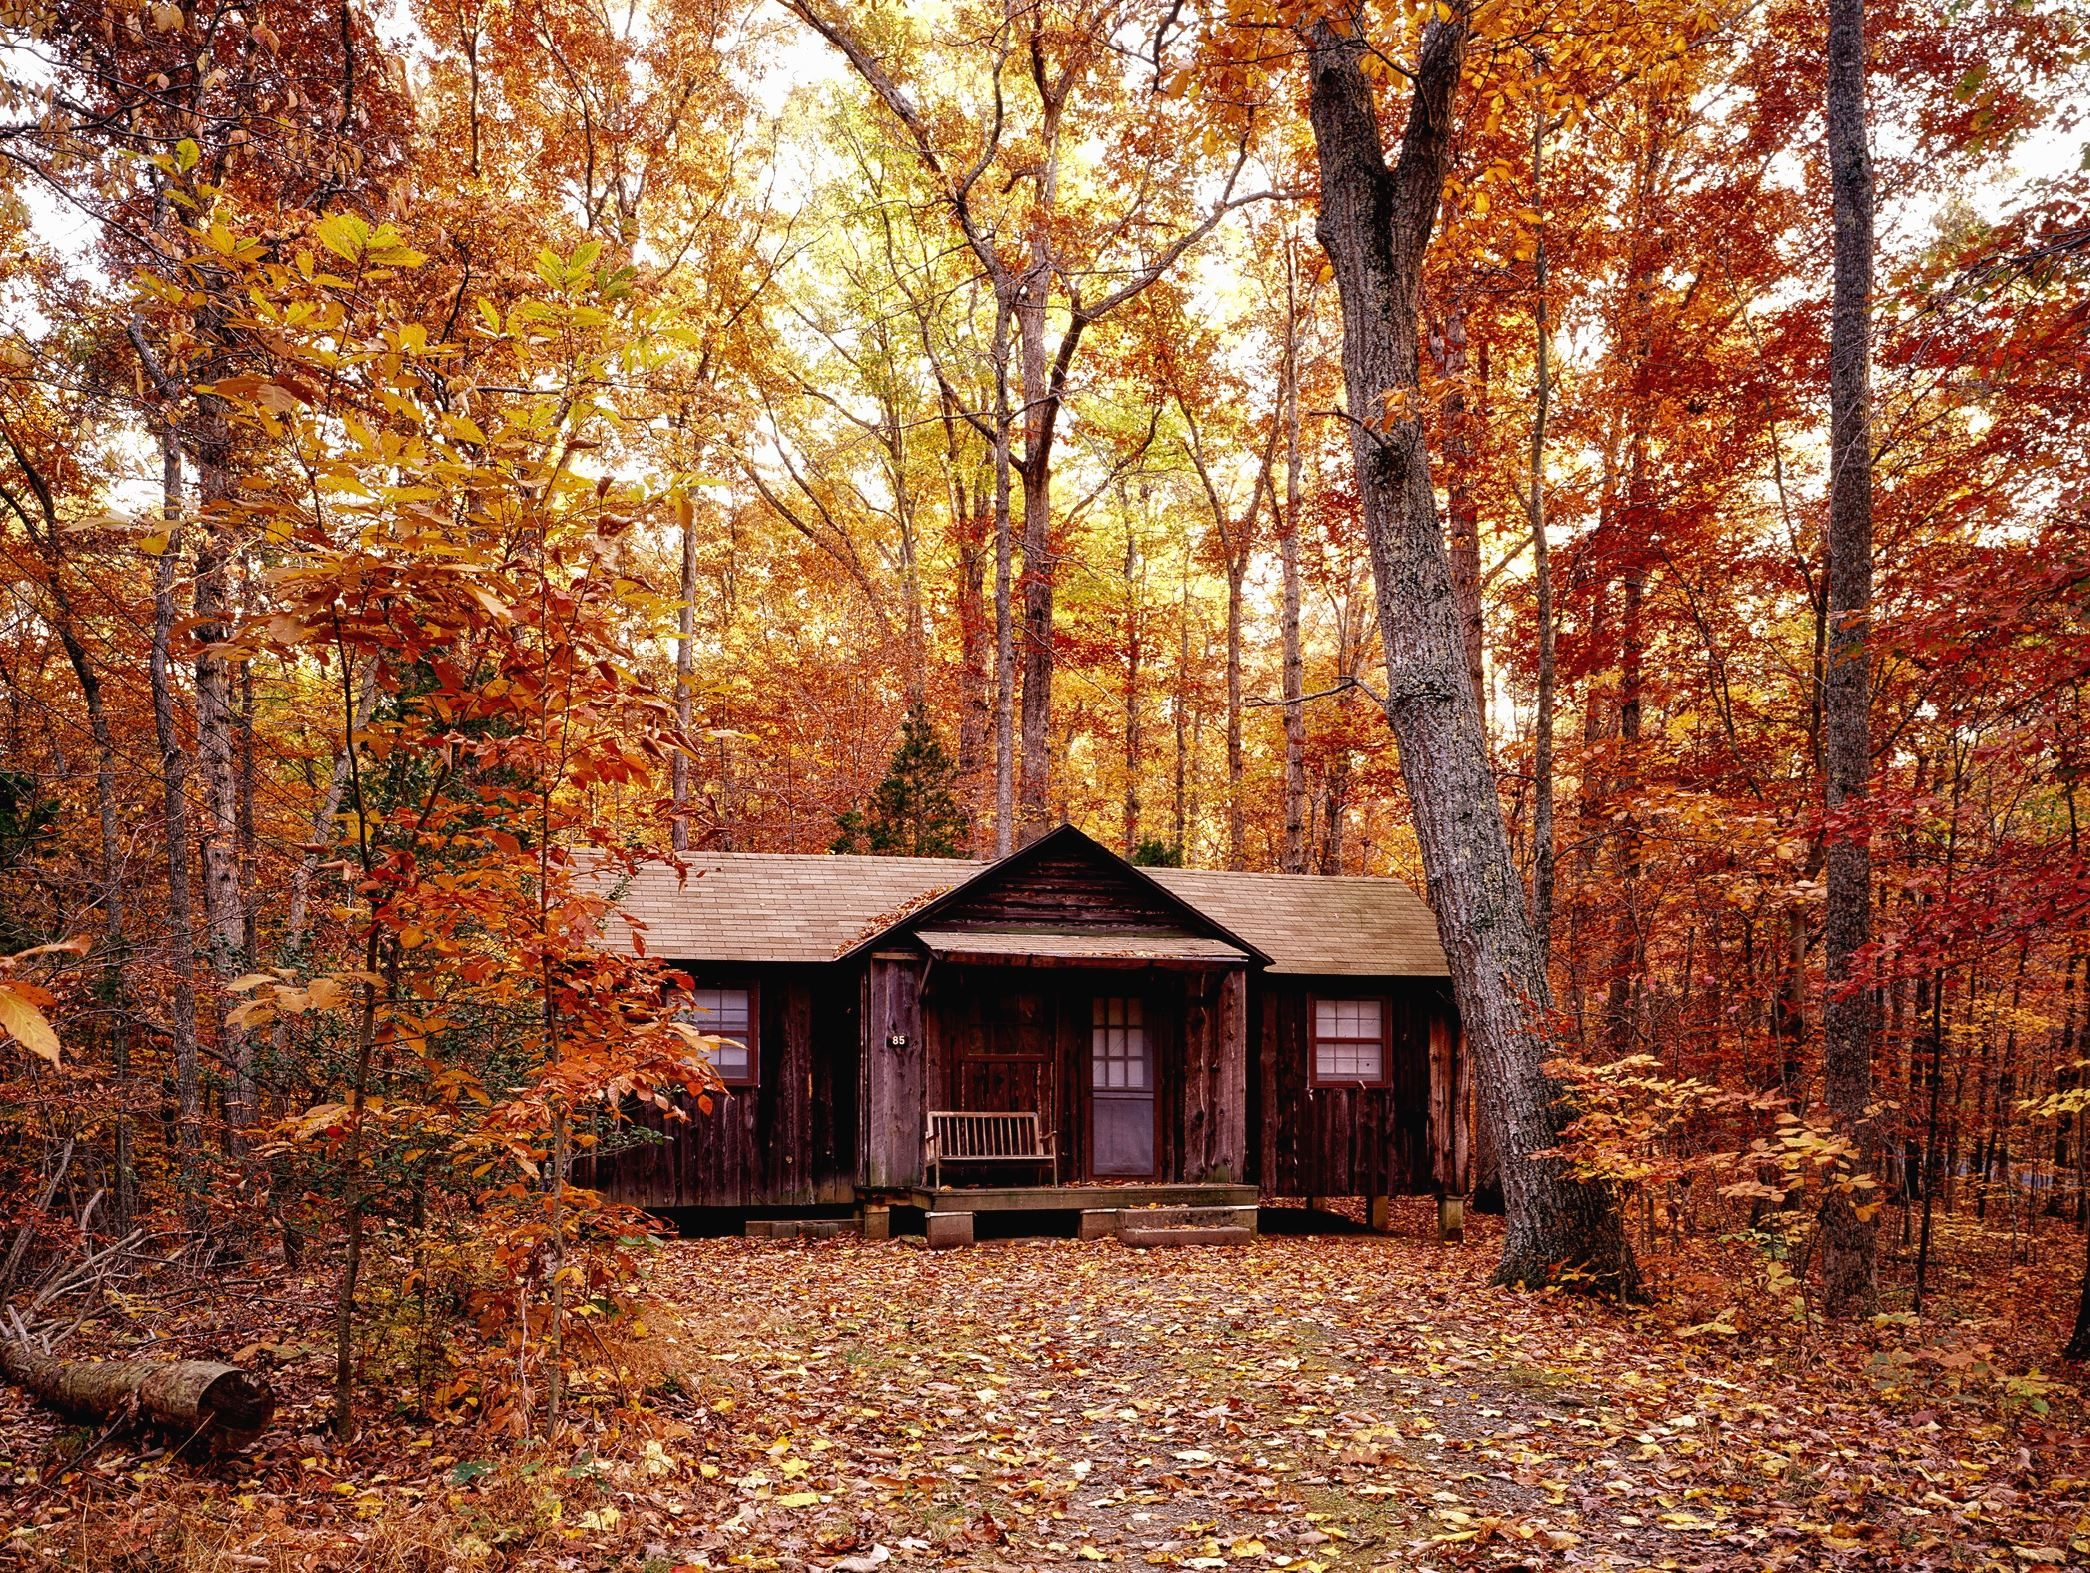 Free picture trees woods autumn leaves beautiful for Paesaggi autunnali per desktop